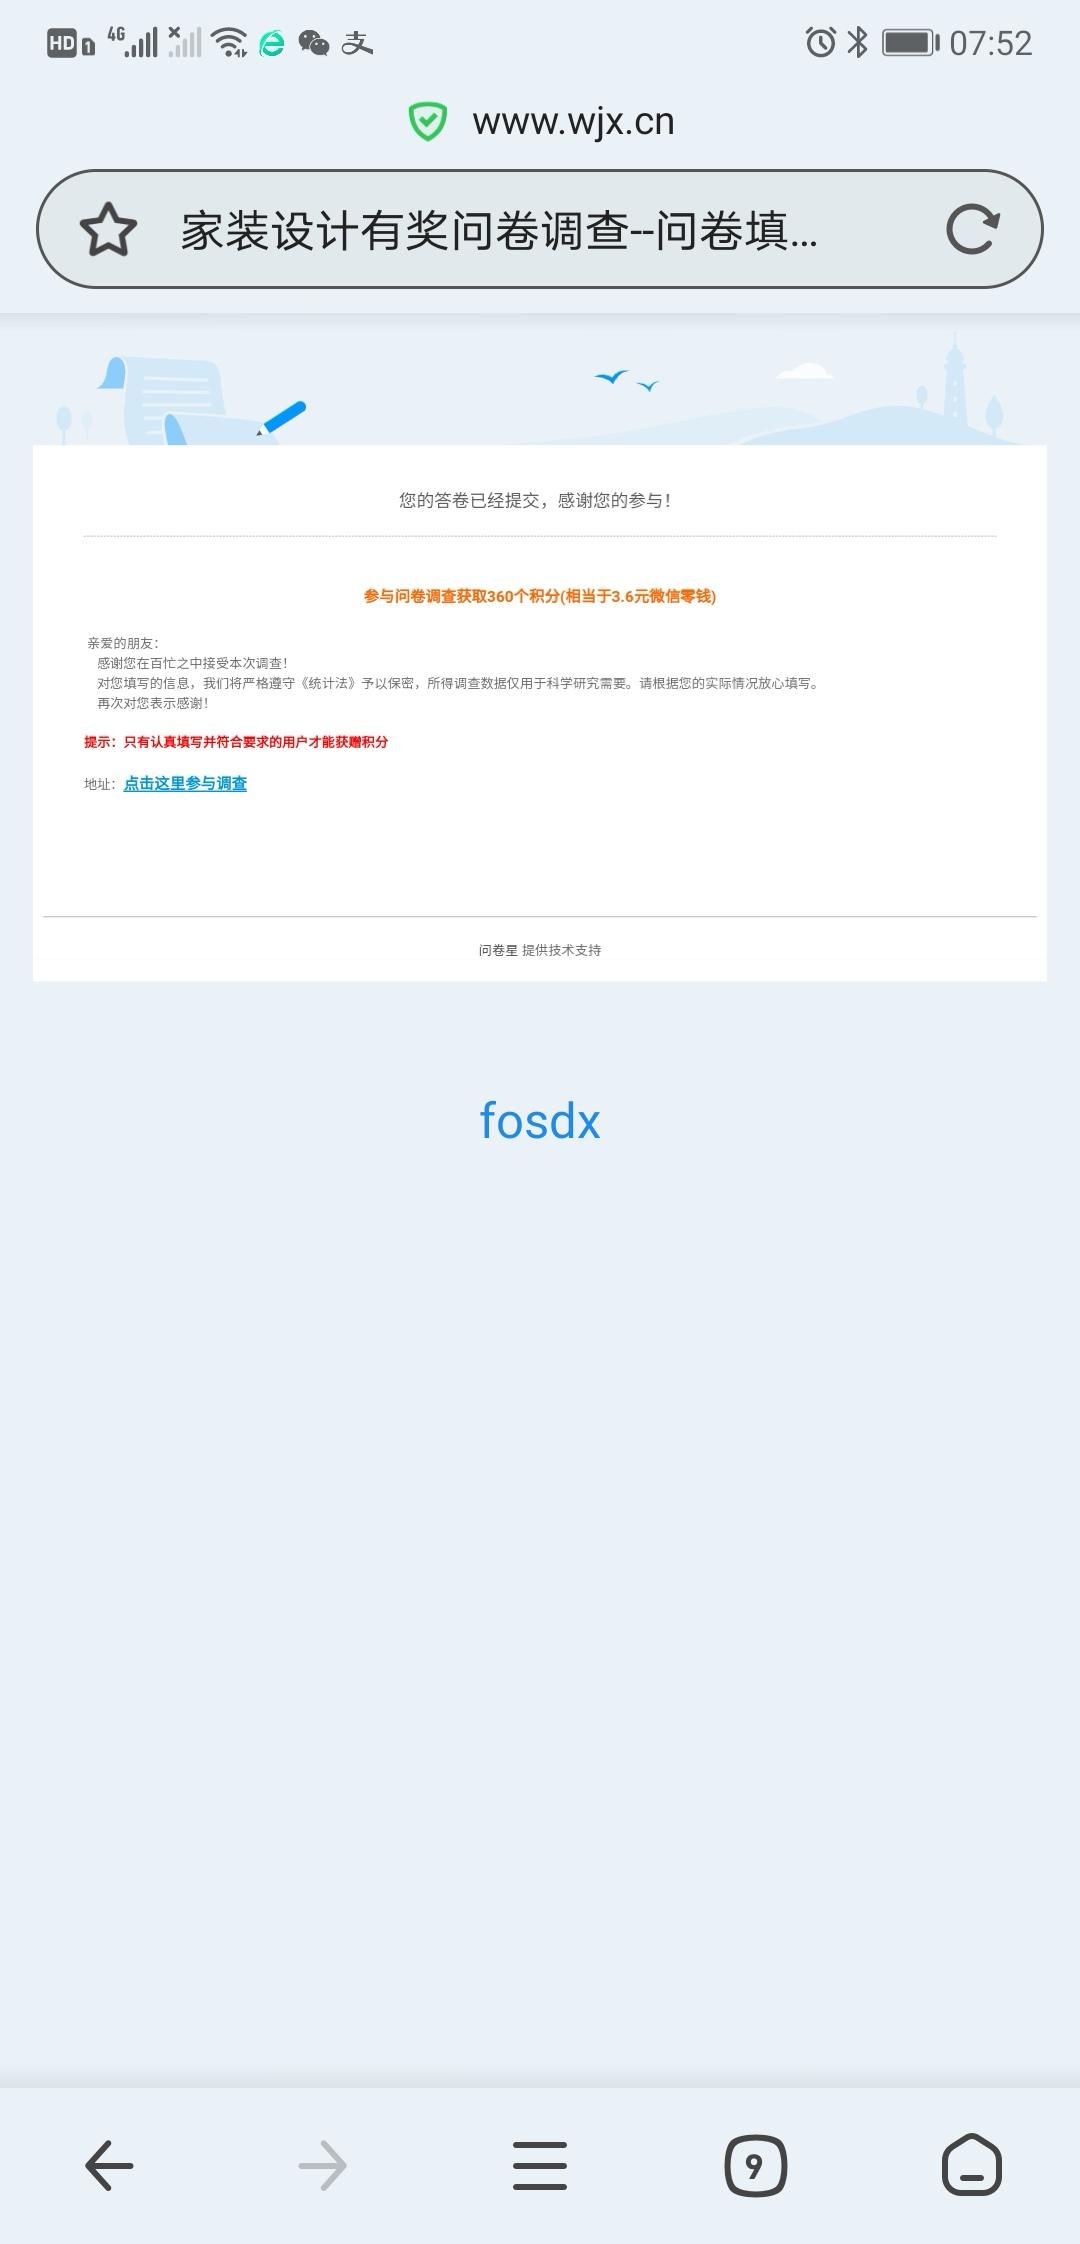 Screenshot_20210411_075245_com.qihoo.browser_edit_105196936948529.jpg